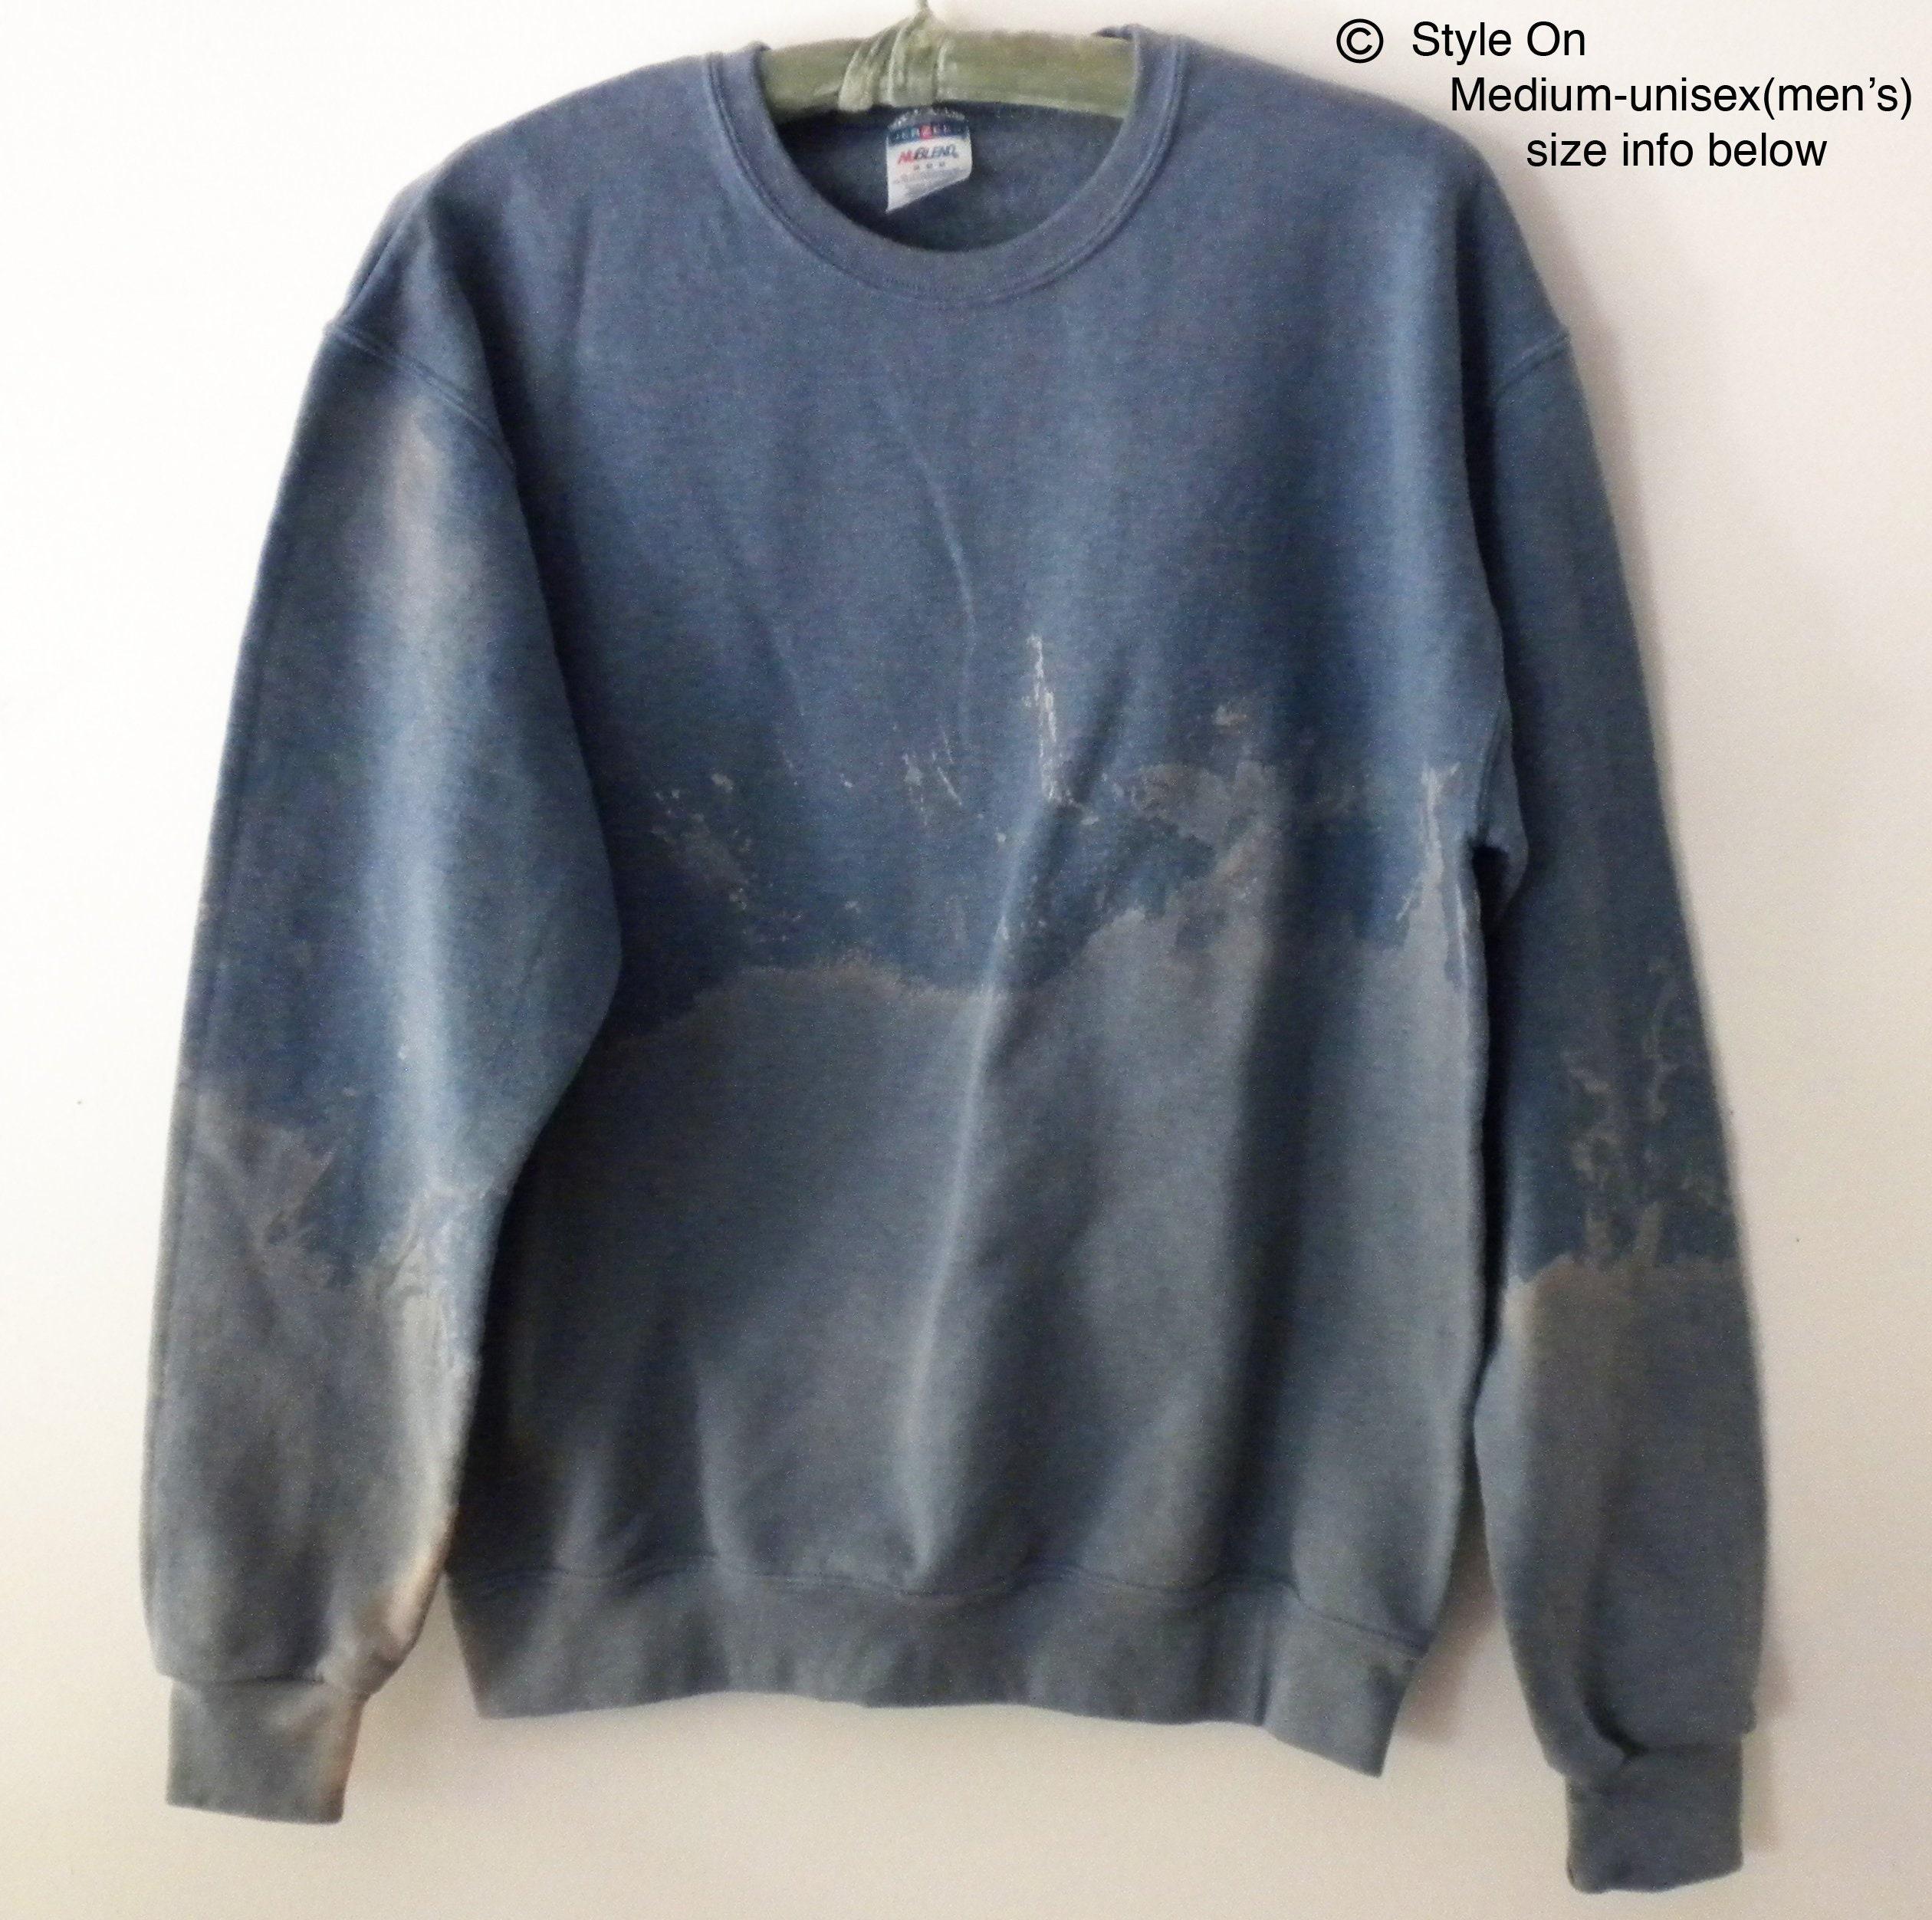 579b2631 Tie dye Blue Sweatshirt Acid wash sweatshirt crewneck | Etsy